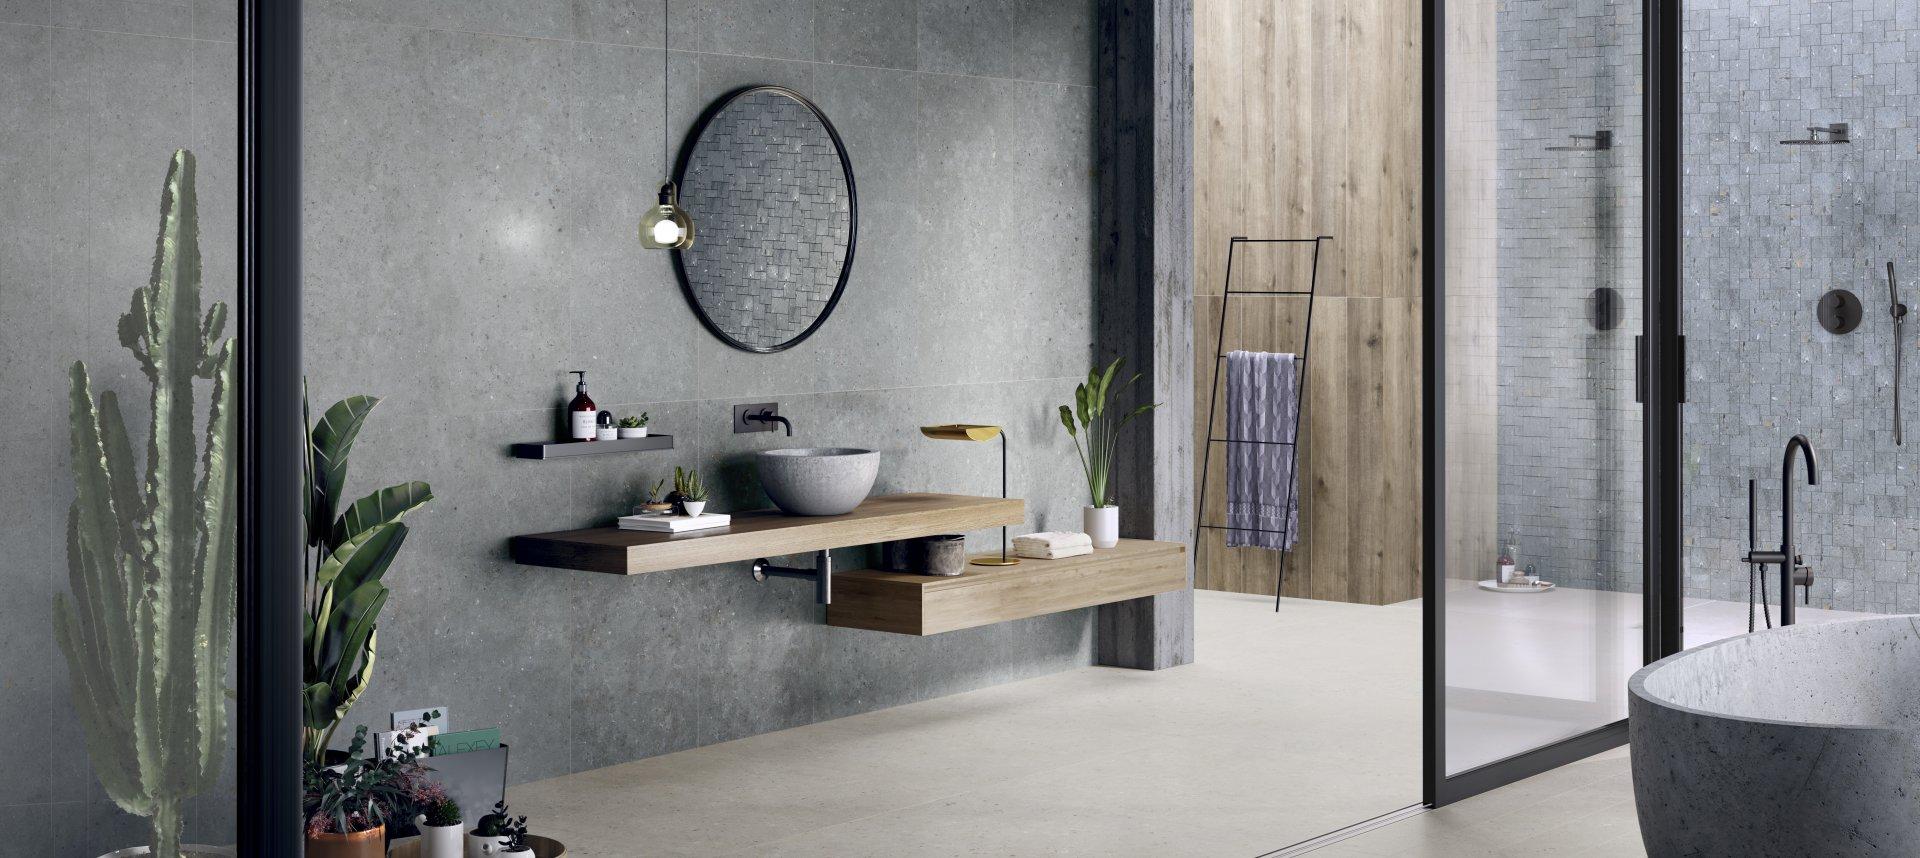 Arredo Bagno Ozzano Emilia.Ceramic Tile Flooring Design From Ceramica Pastorelli